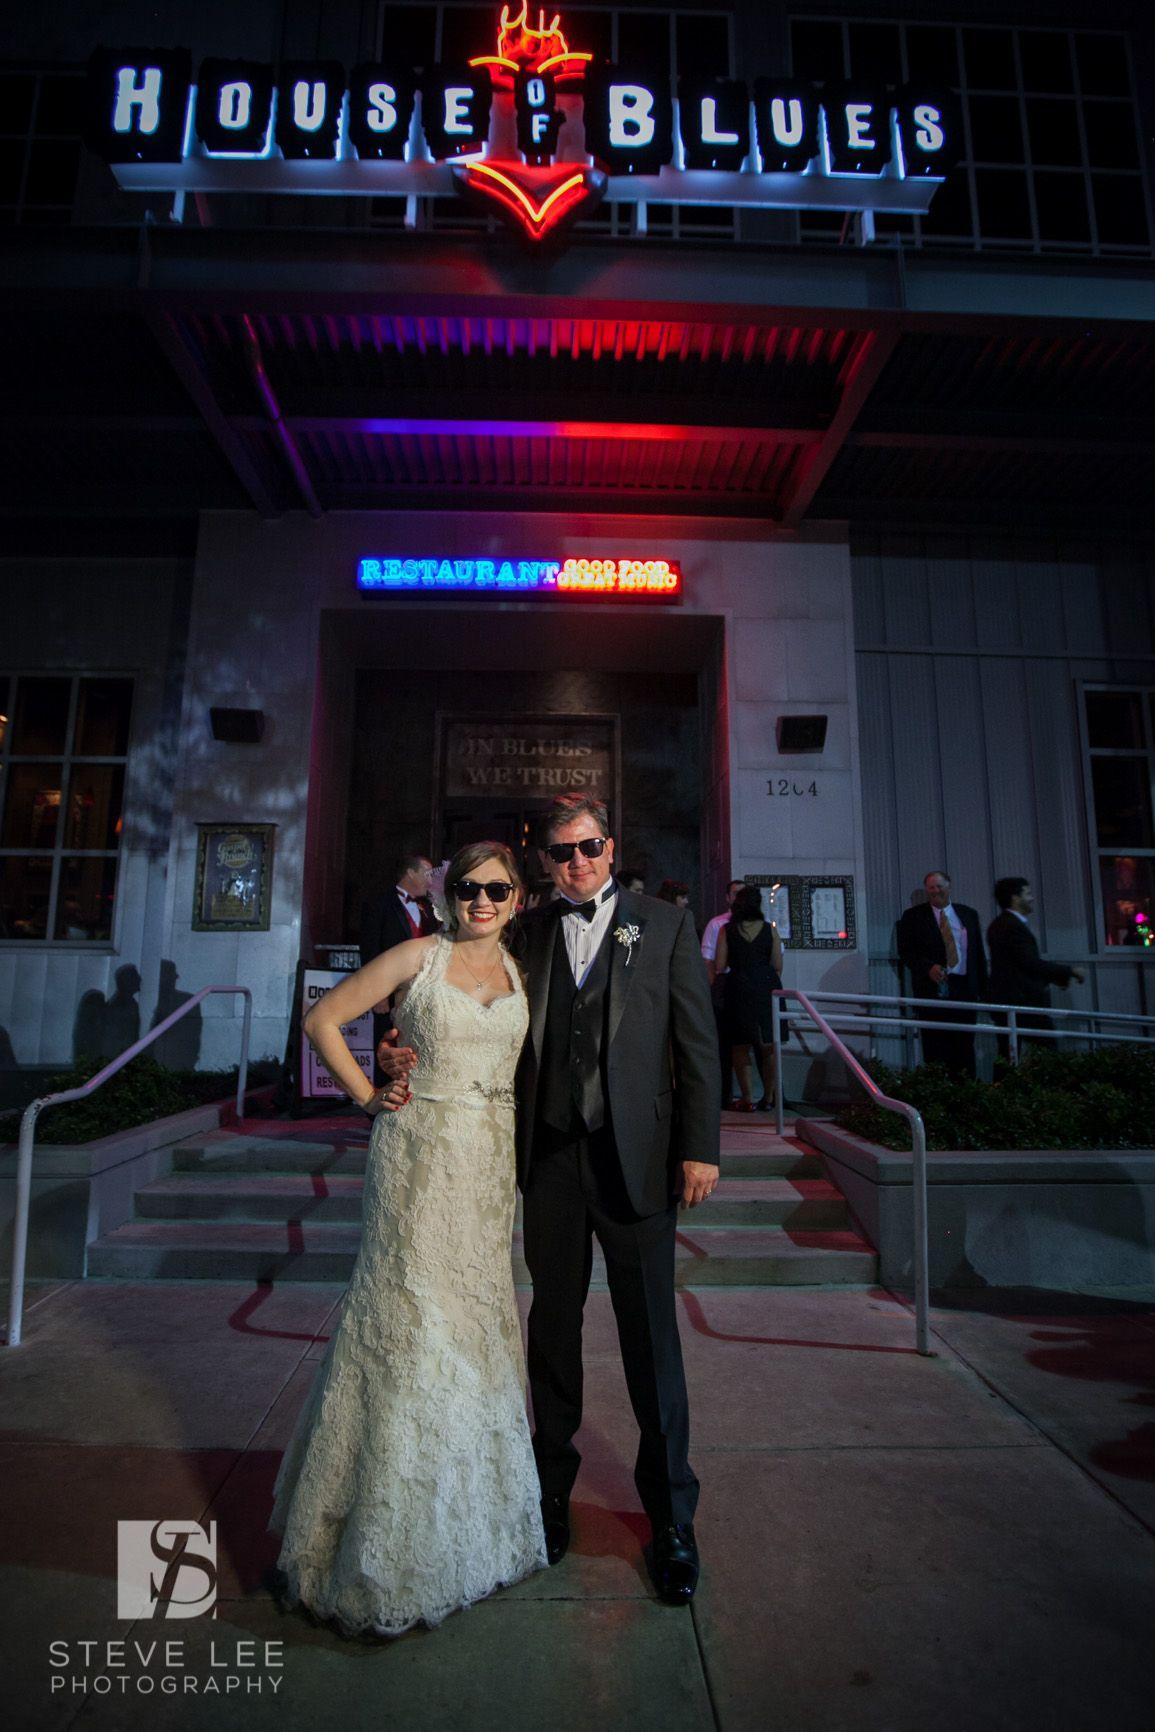 House Of Blues Houston Bride And Groom Steve Lee Photography Weddings Wedding Moments Wedding Photography